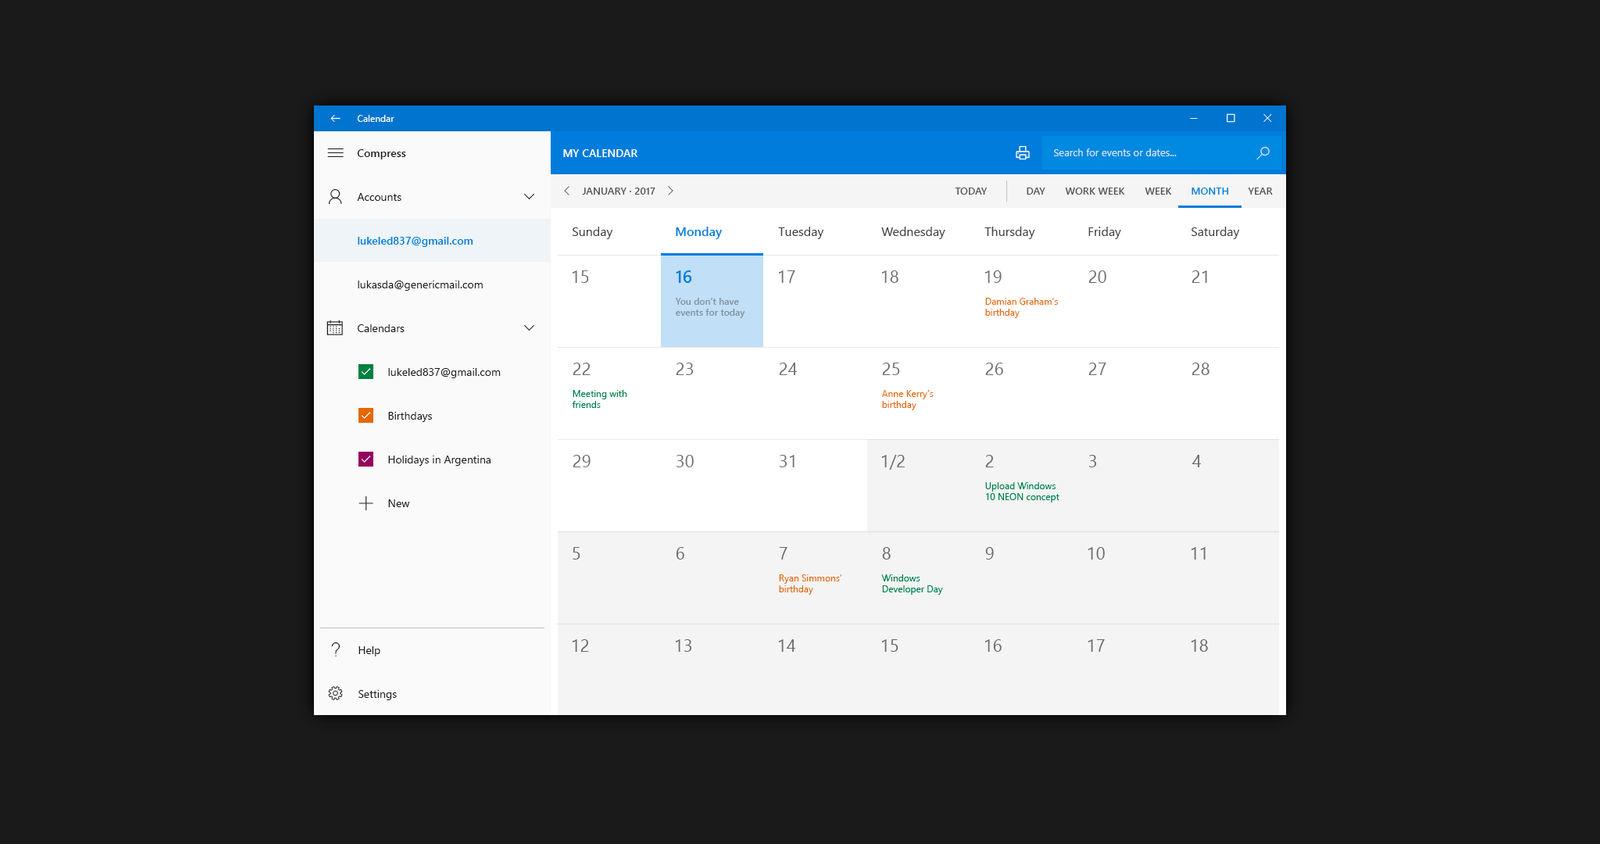 Windows 10 NEON: Calendar